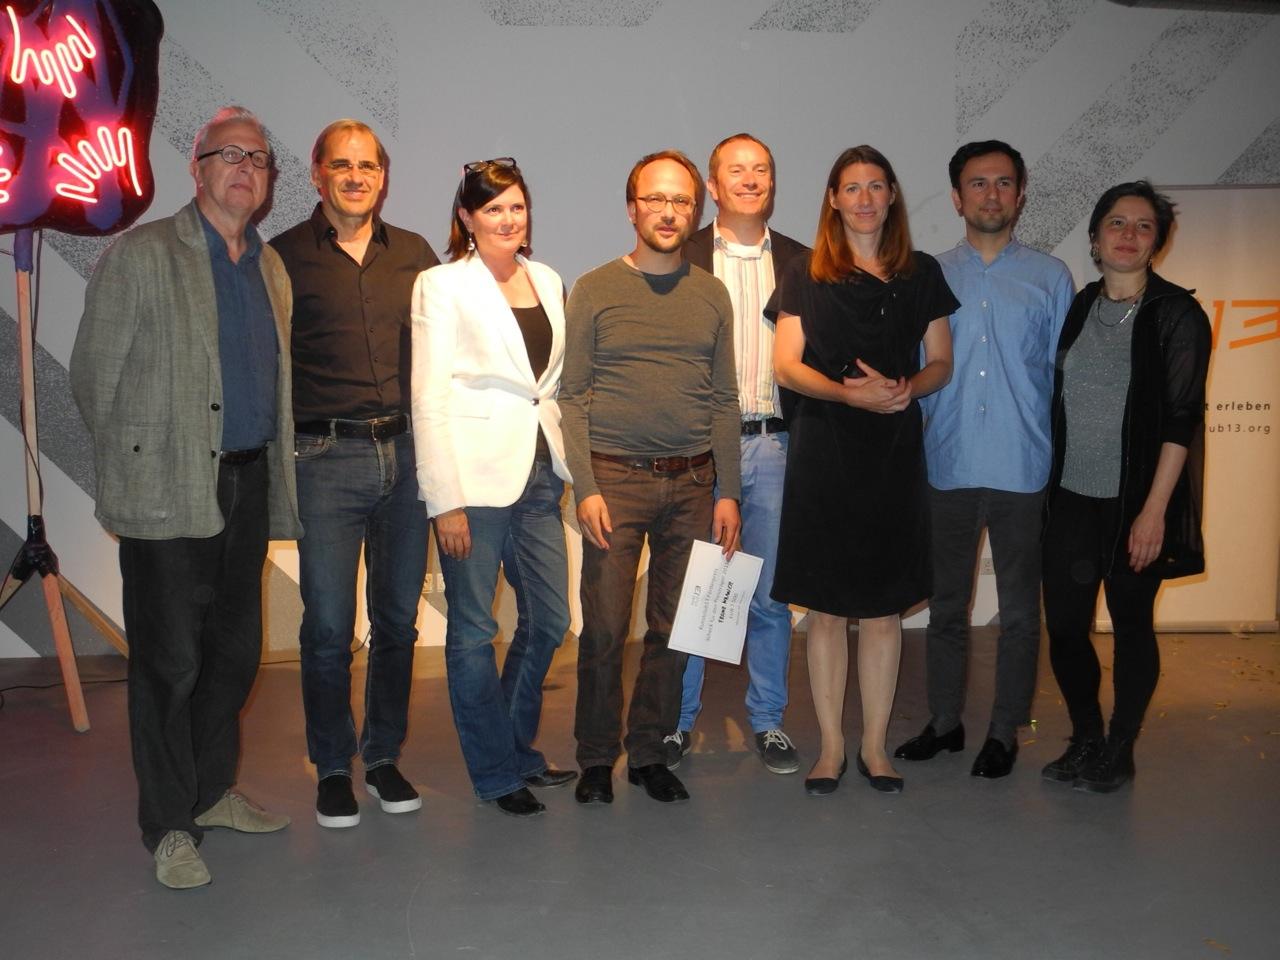 Kunstpreis 2015